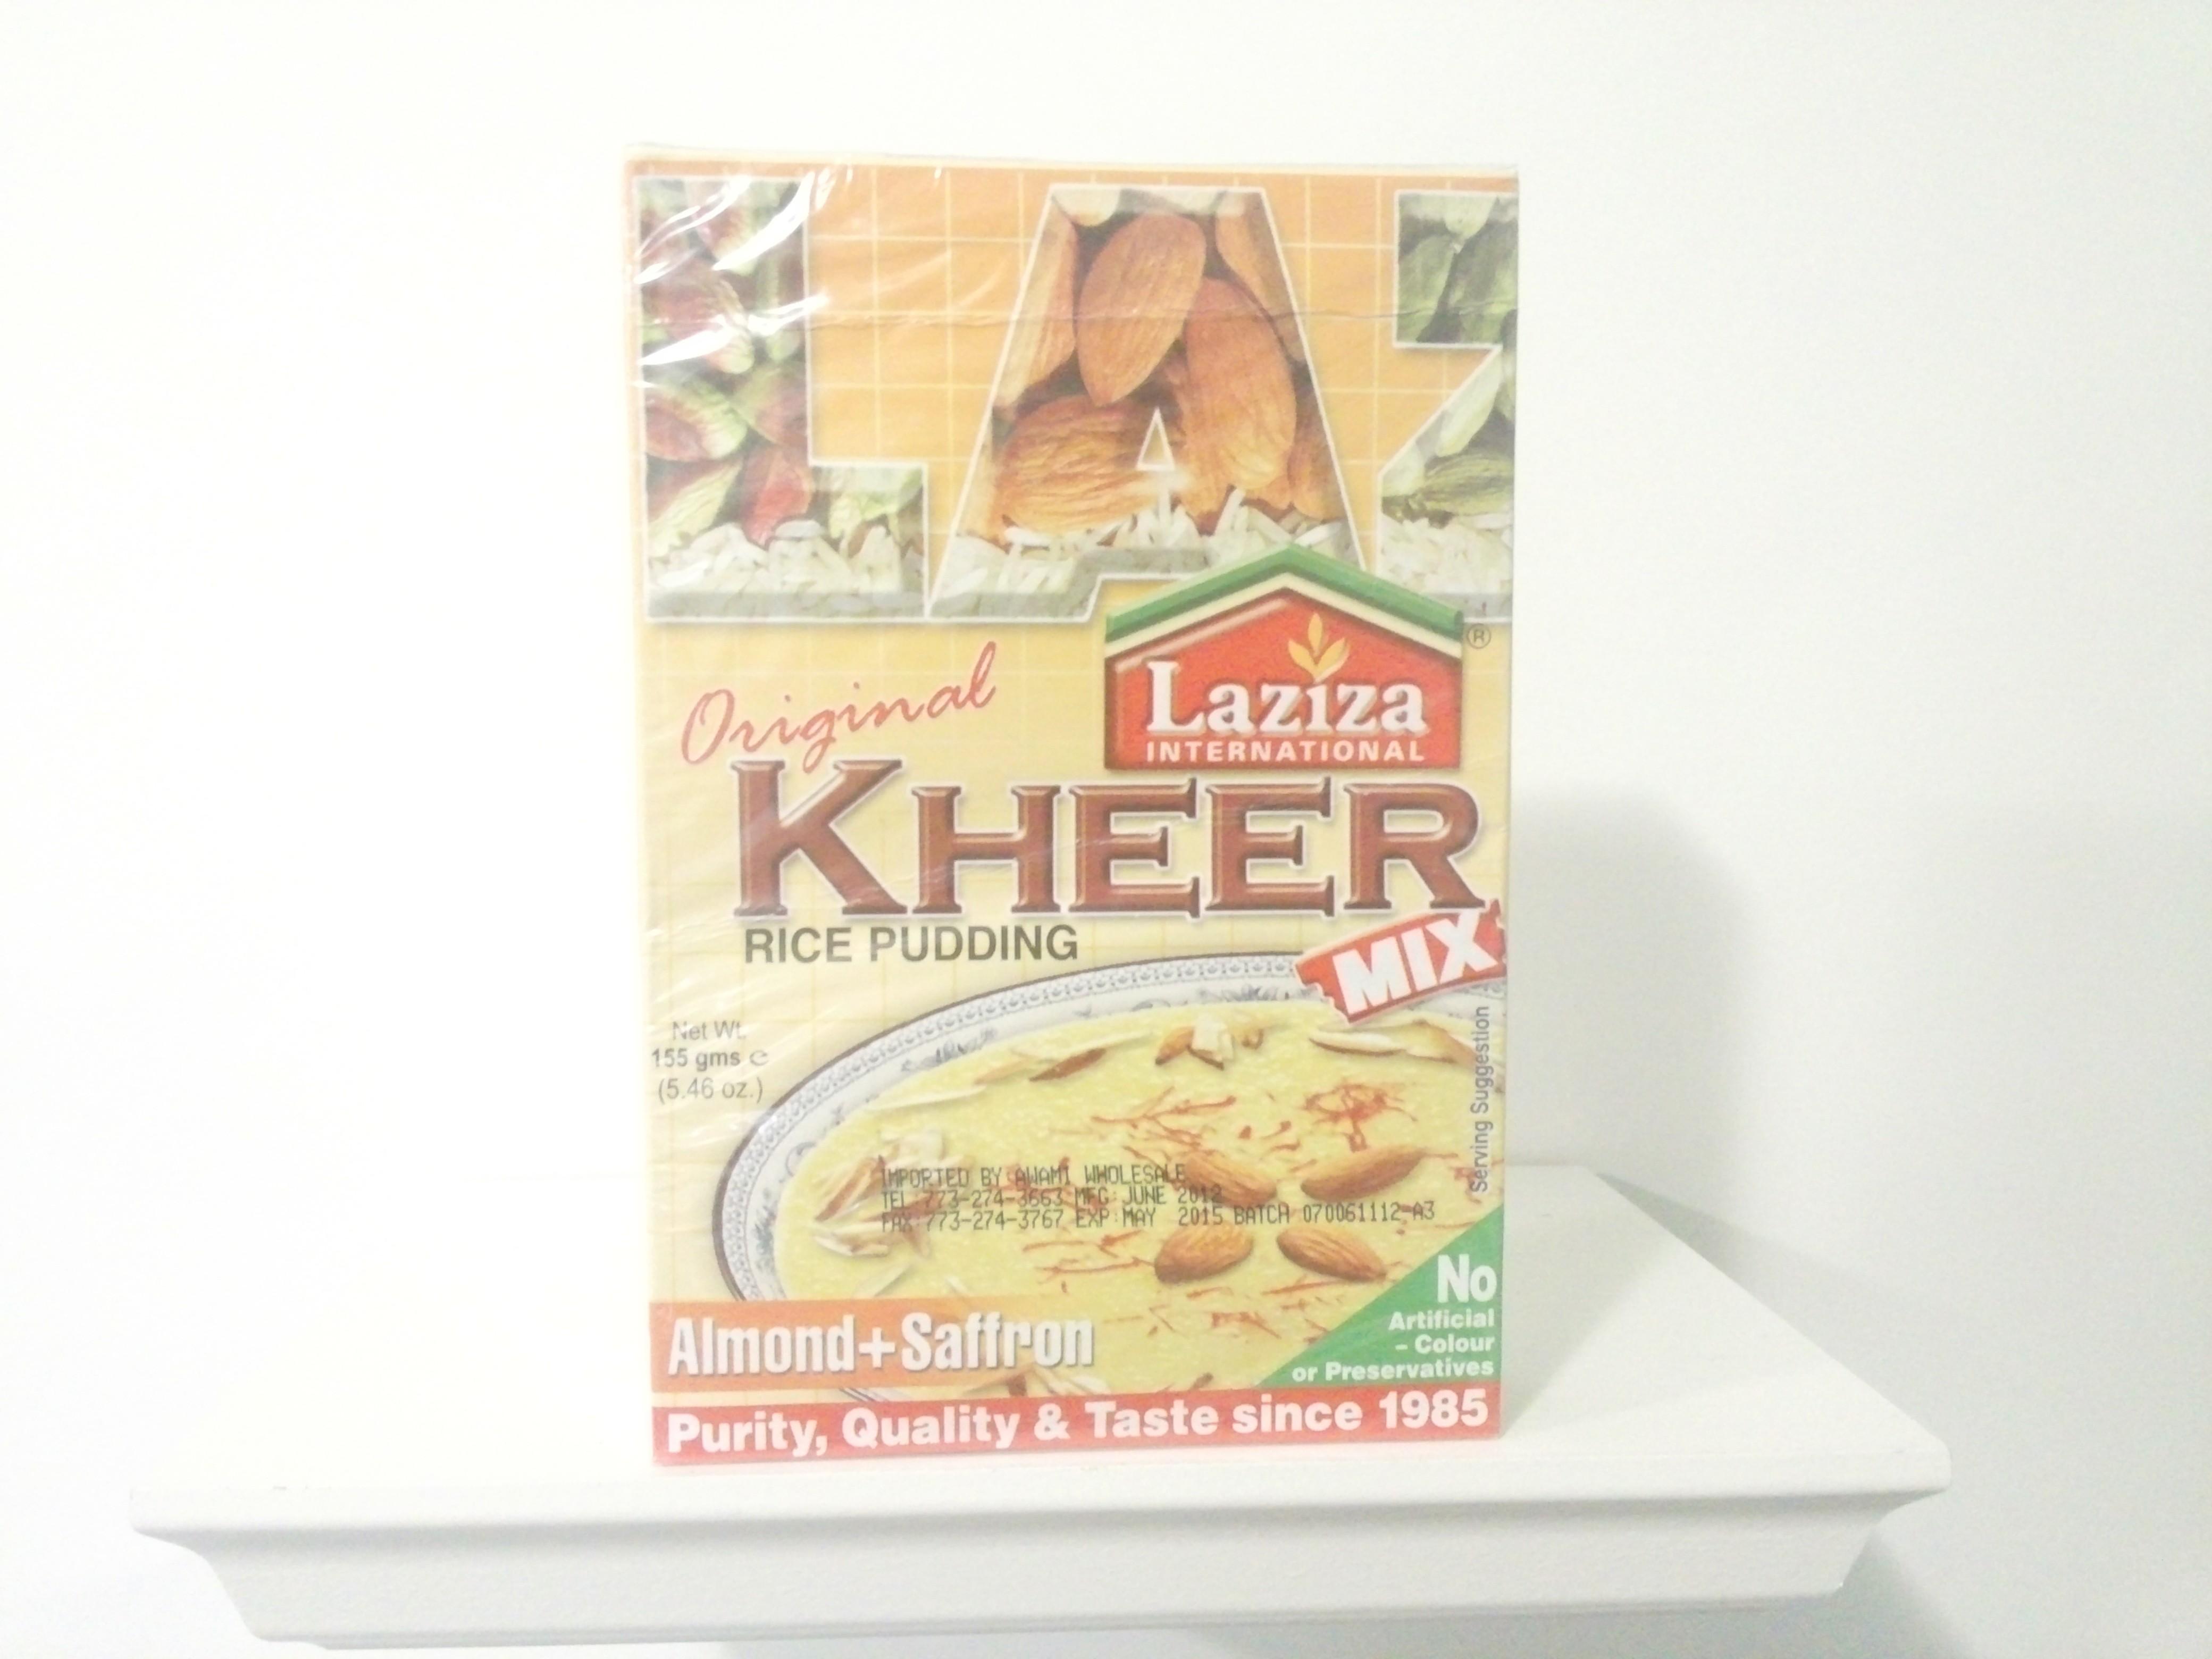 Laziza Kheer Mix (Almond+Saffron) 155 grm